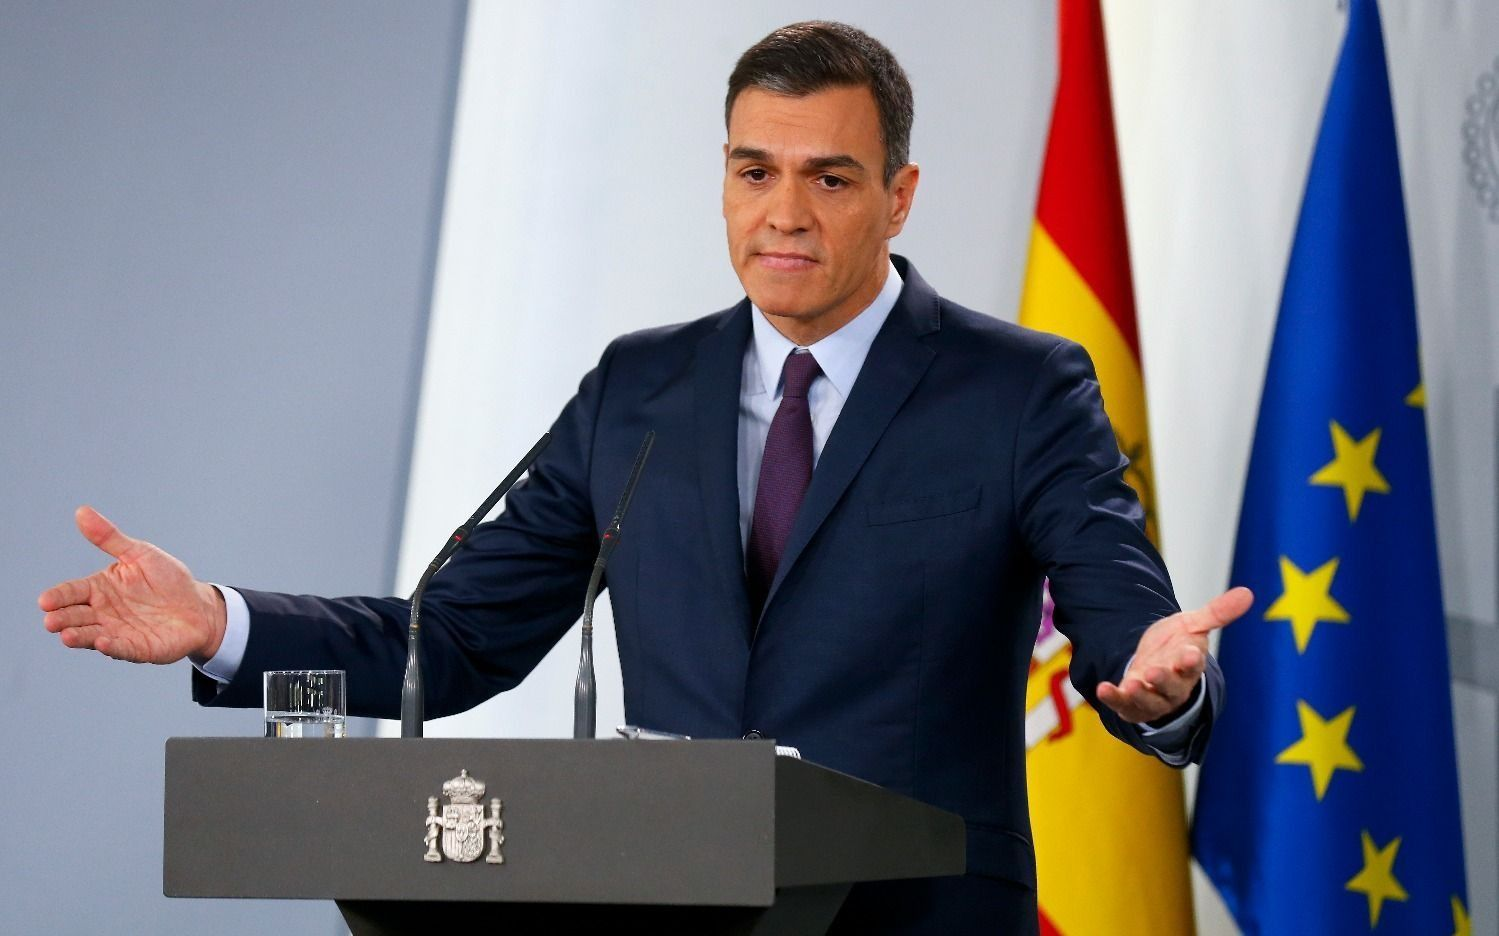 Llaman en España a elecciones anticipadas